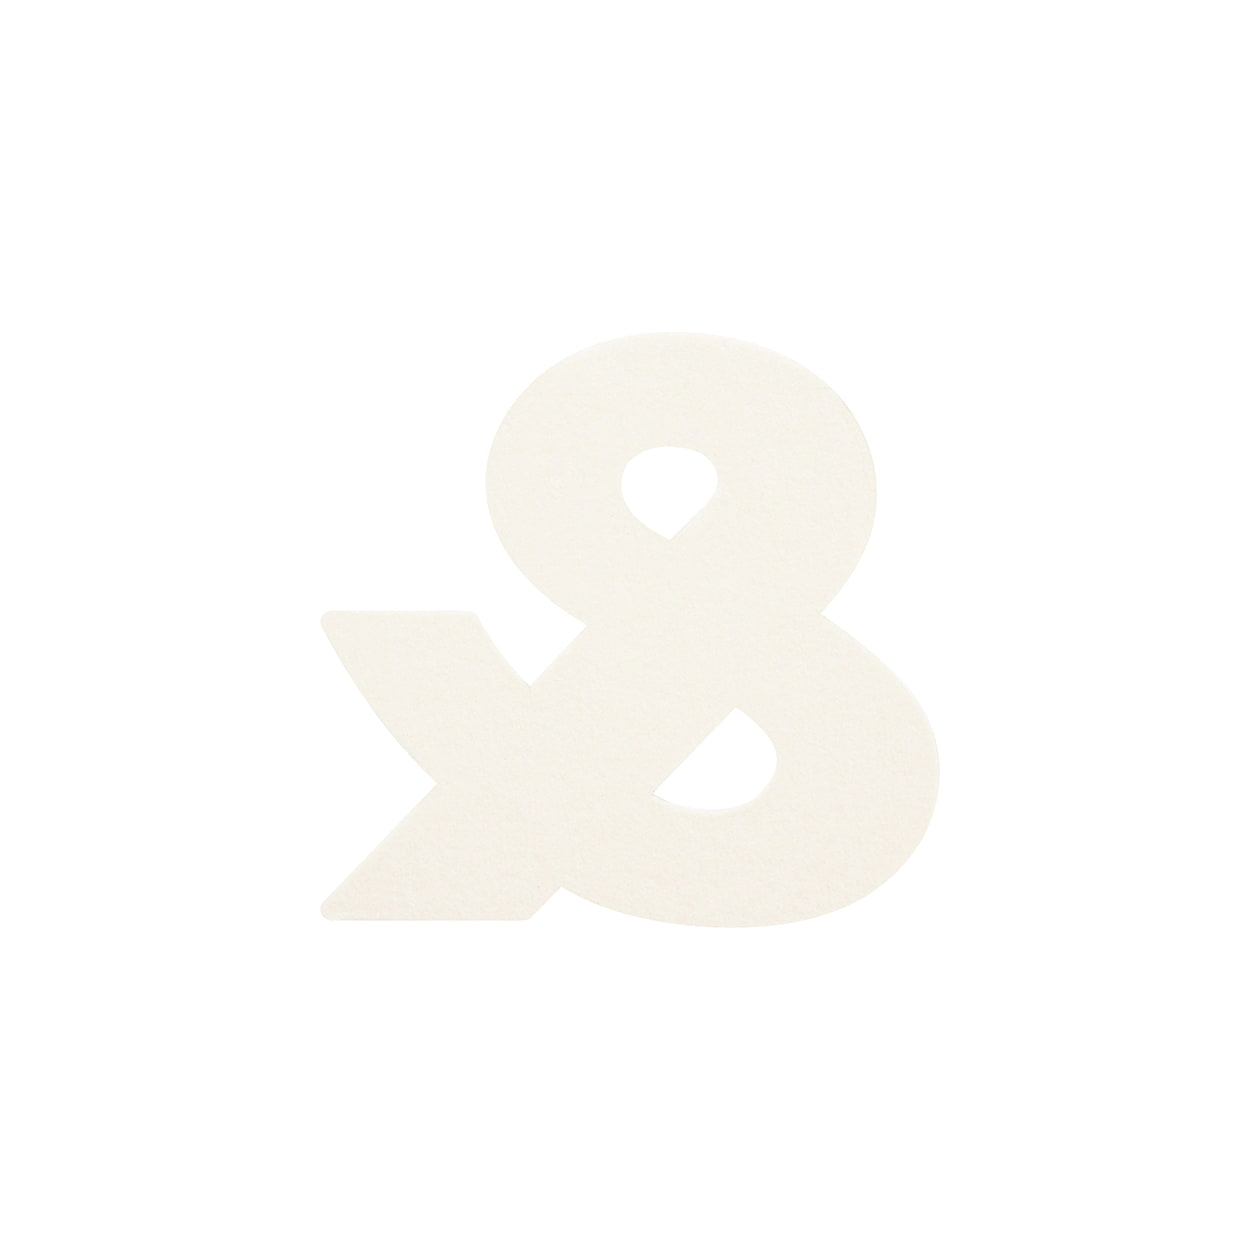 No.395ボード A7カードDC 文字& シルバー